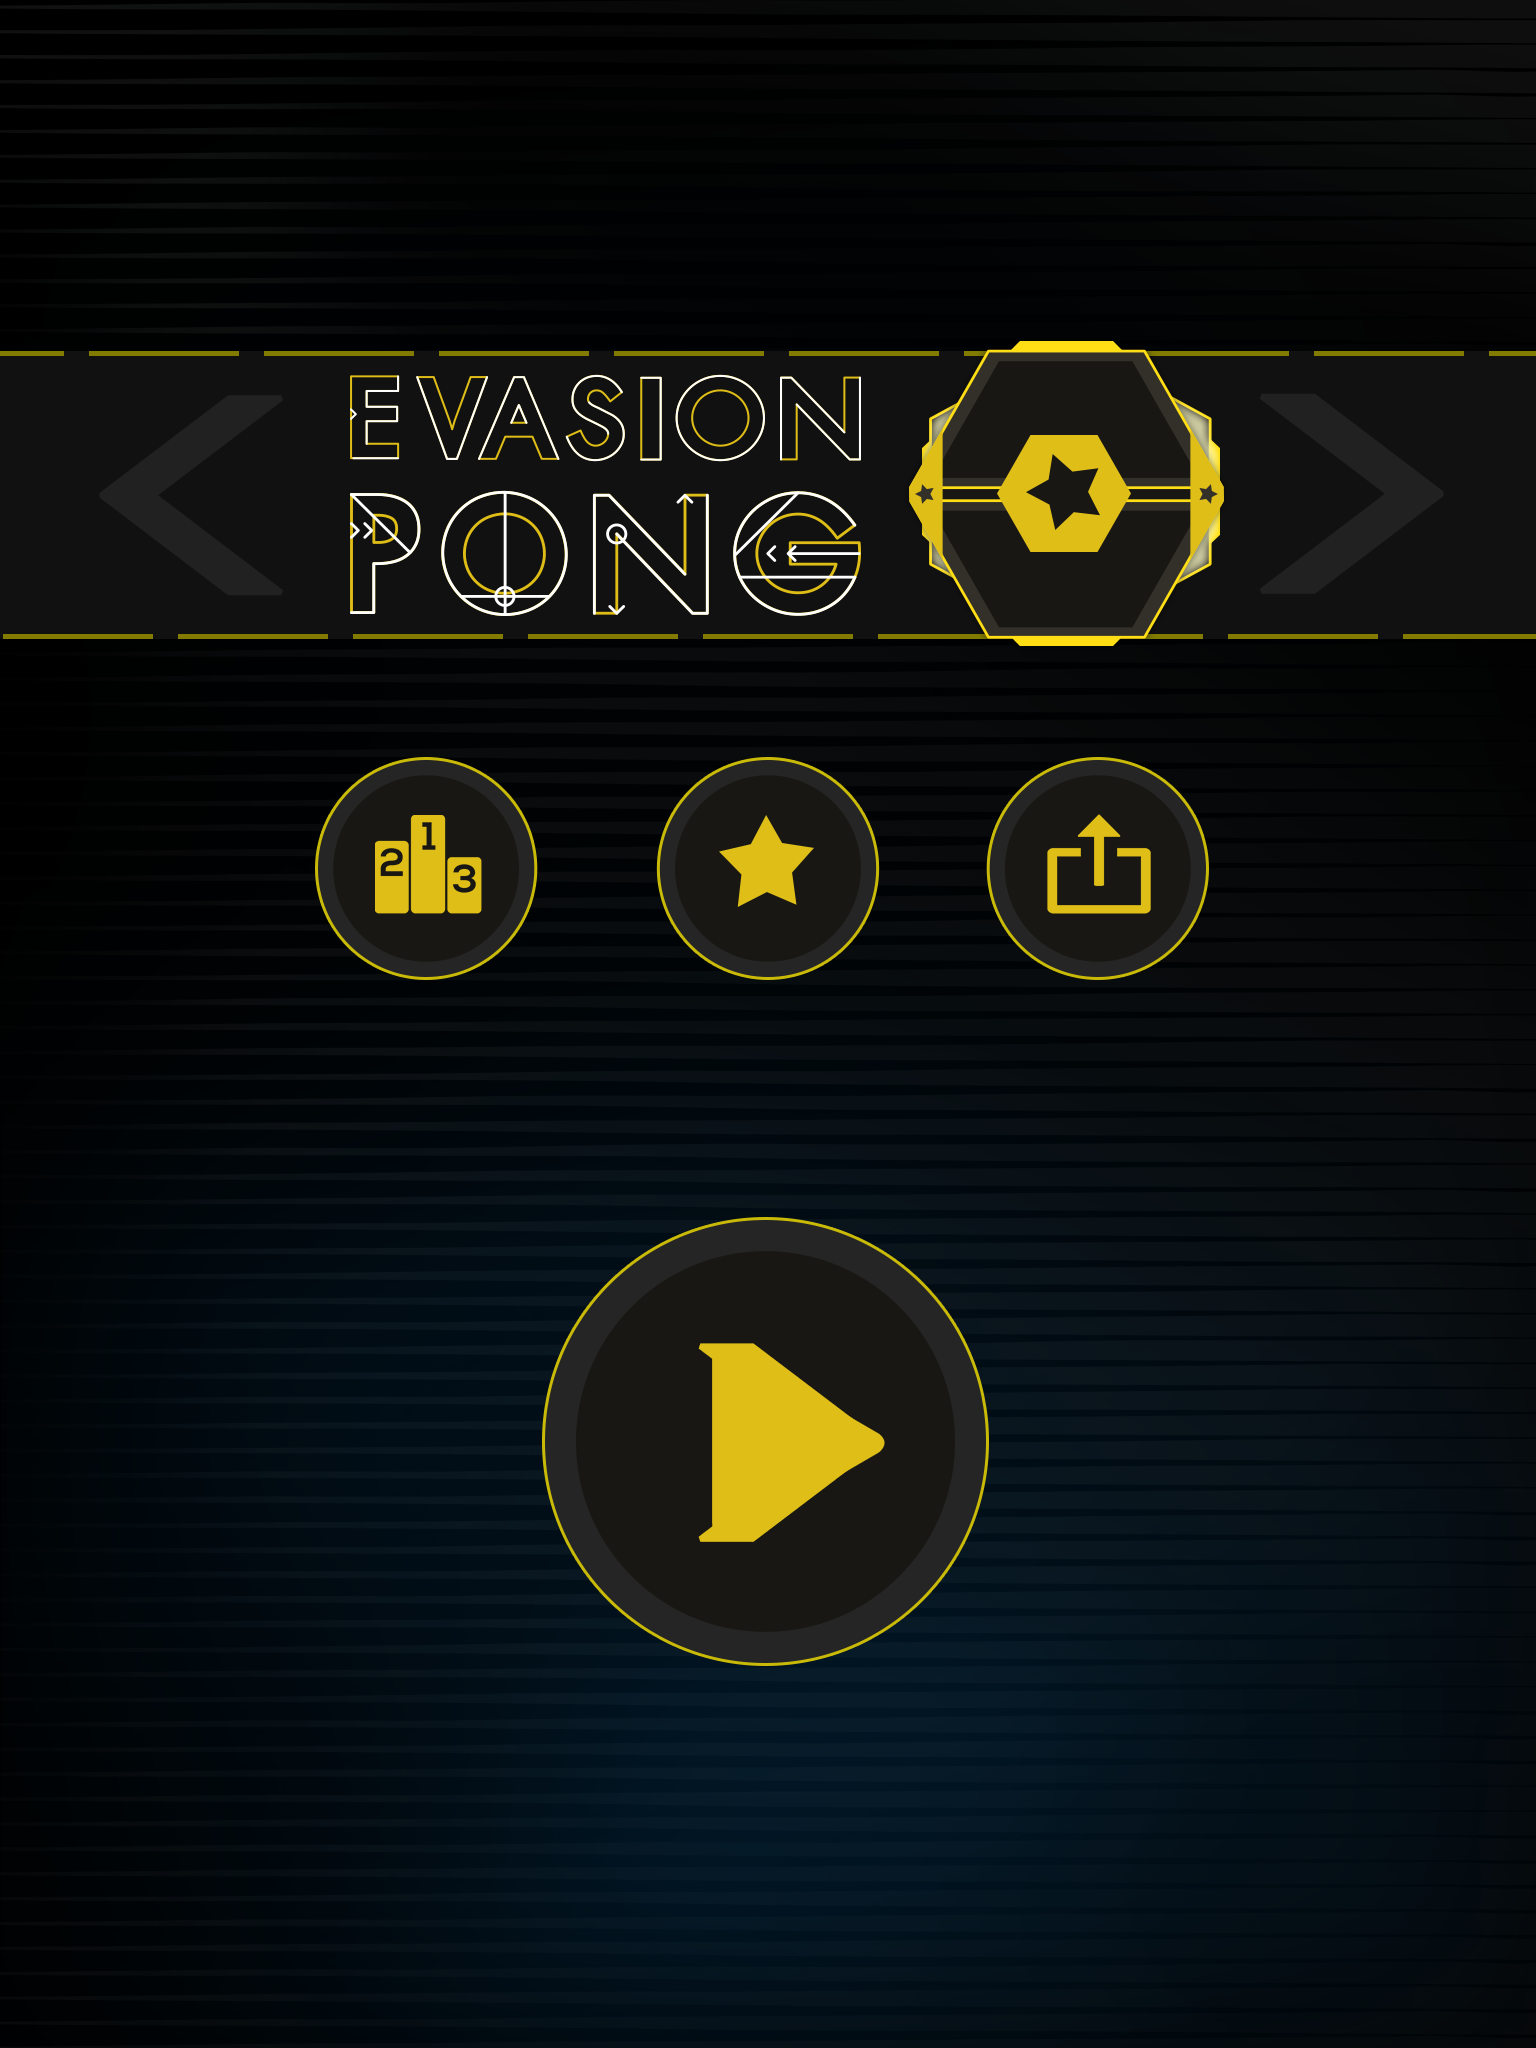 Evasion_Pong_1.png